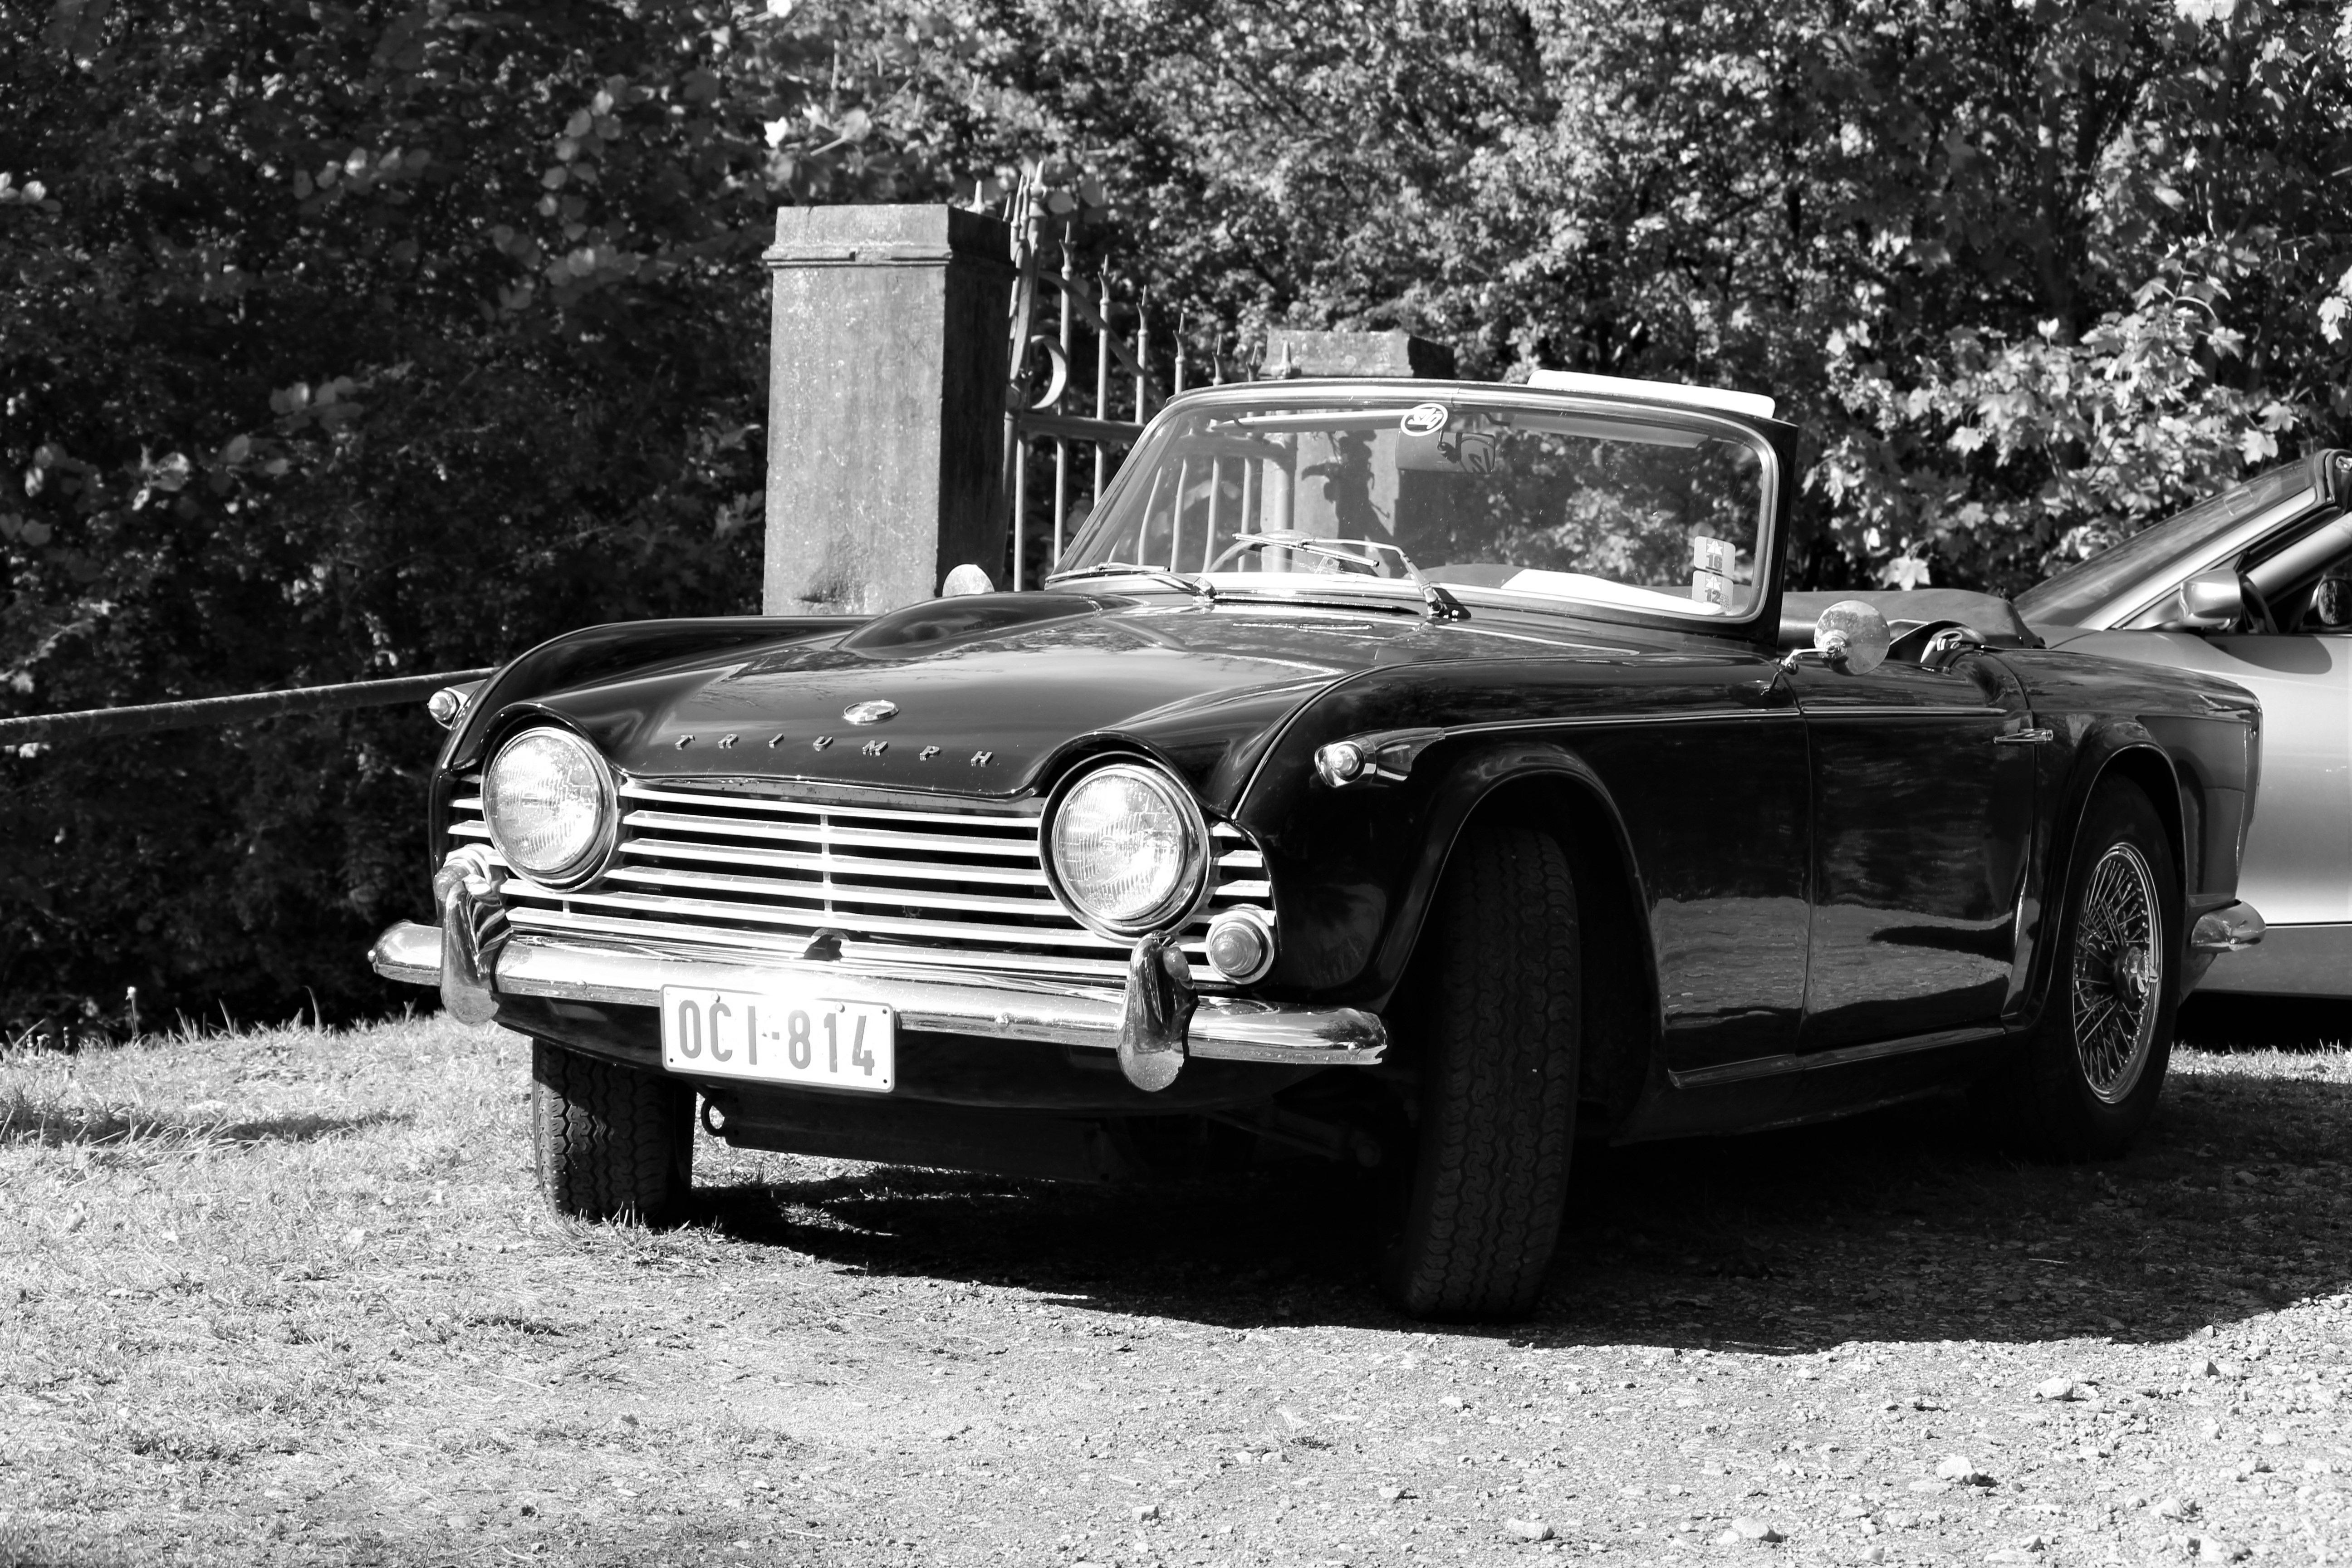 Free Images Black And White Retro Machine Clic Car Sports Vintage Race Sedan Convertible Old Cars Antique Land Vehicle